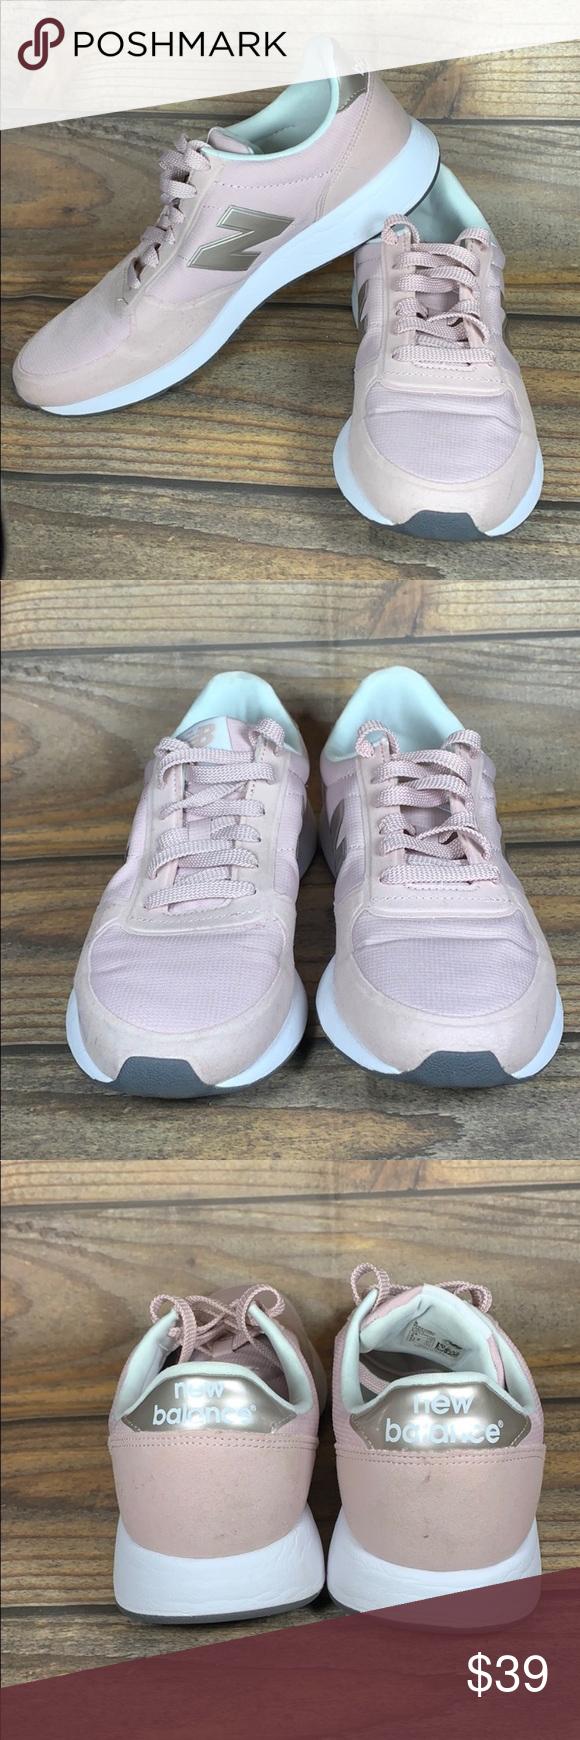 Balance cushioning comfort insert shoes